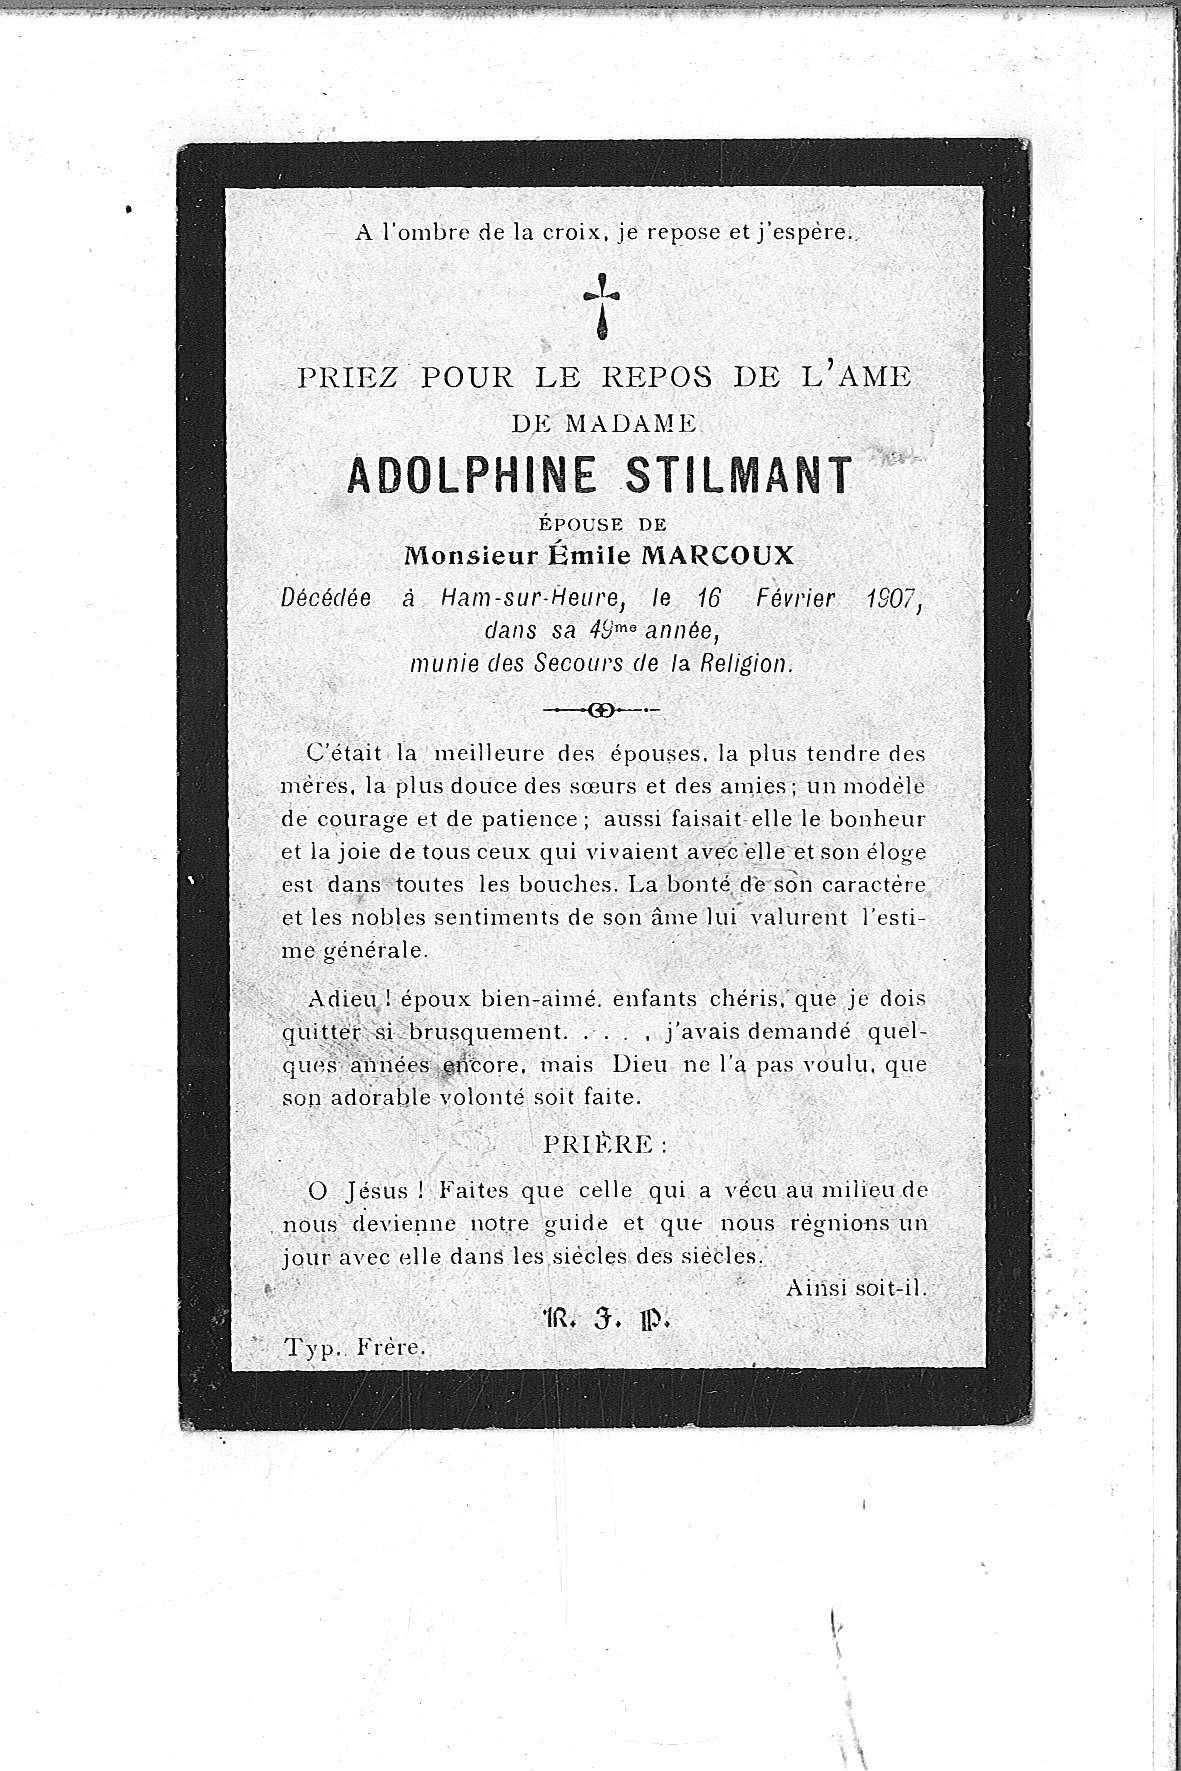 Adolphine(1907)20140616105910_00065.jpg